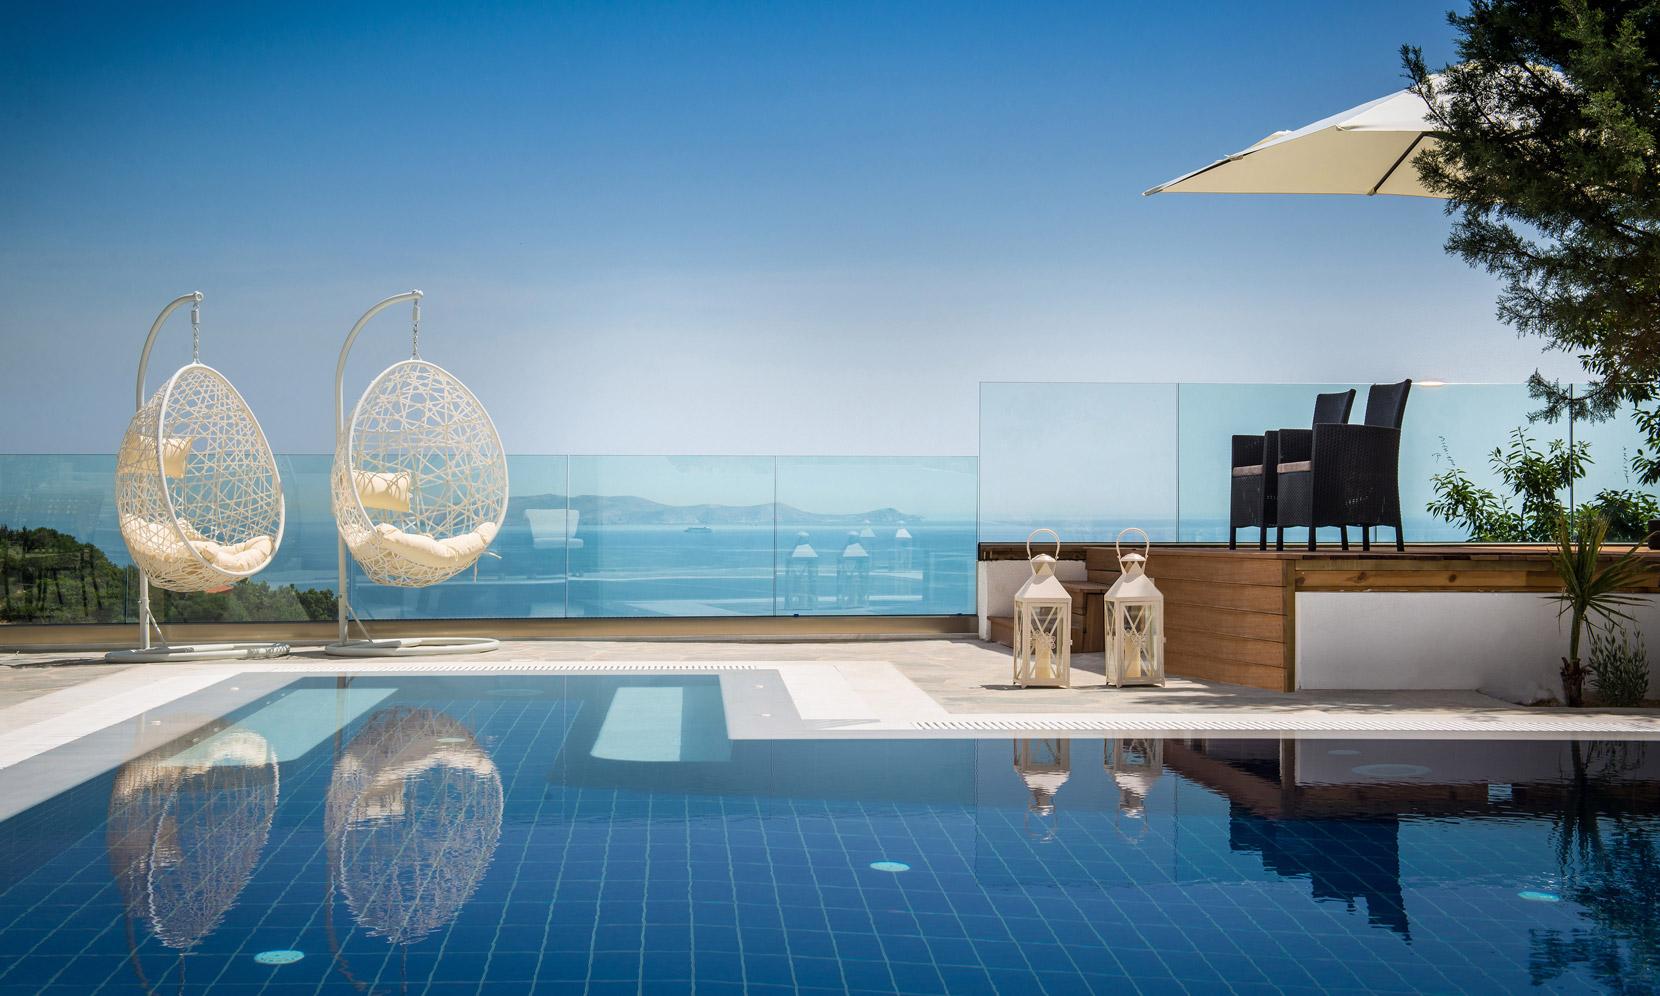 Crete Villa Harper jumbotron image